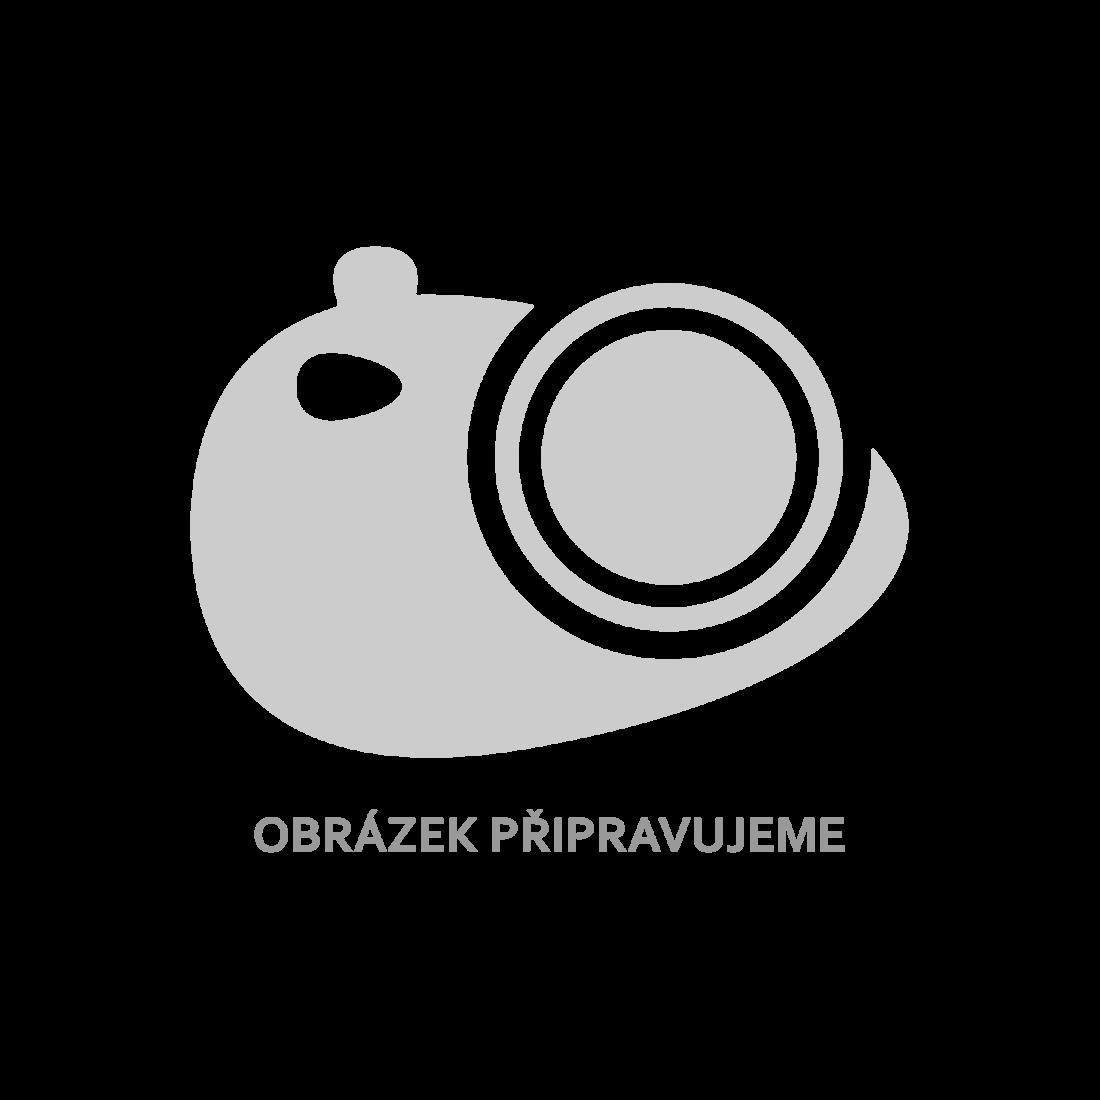 Roleta Zebra / noc a den / Twinroll 140 x 175 cm, kávová